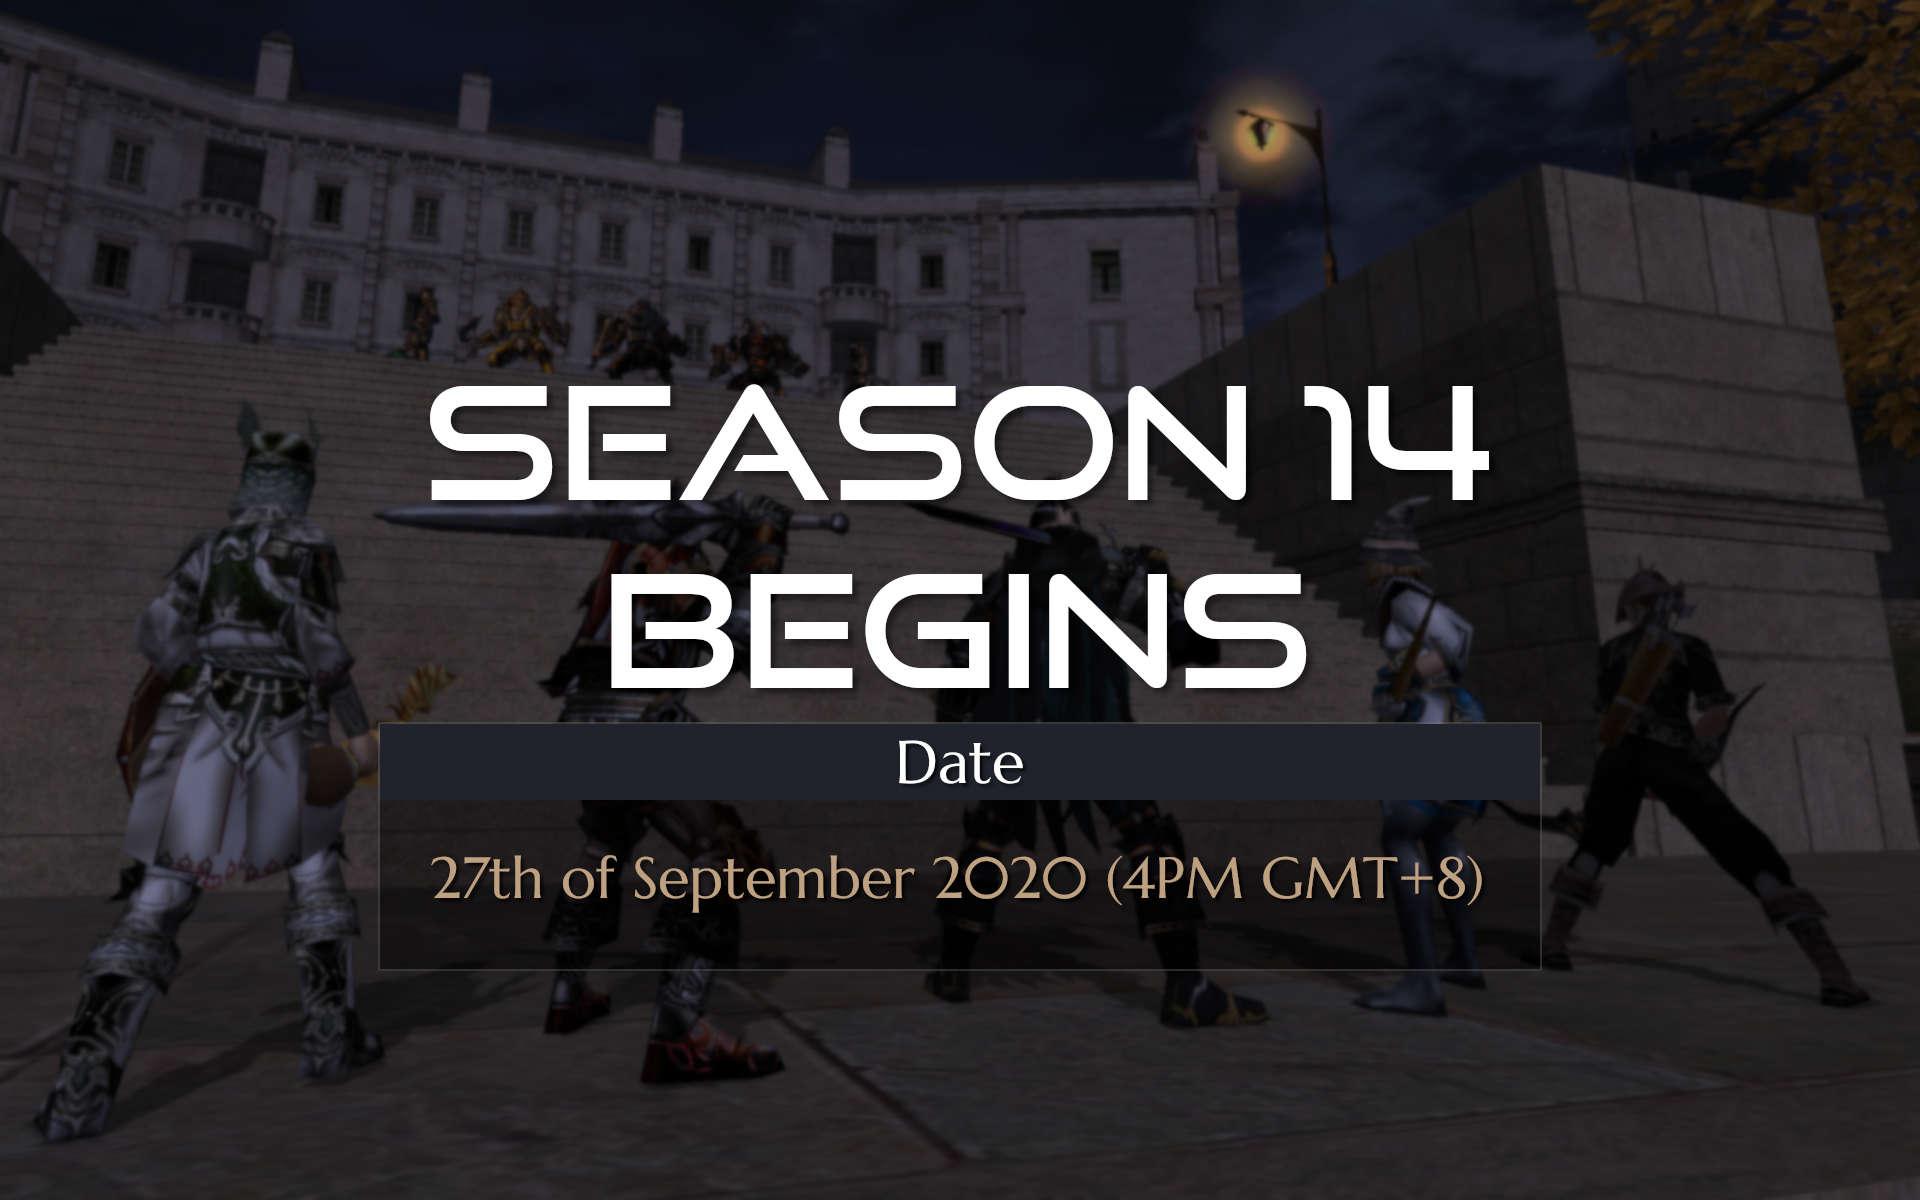 Season 14 (2)